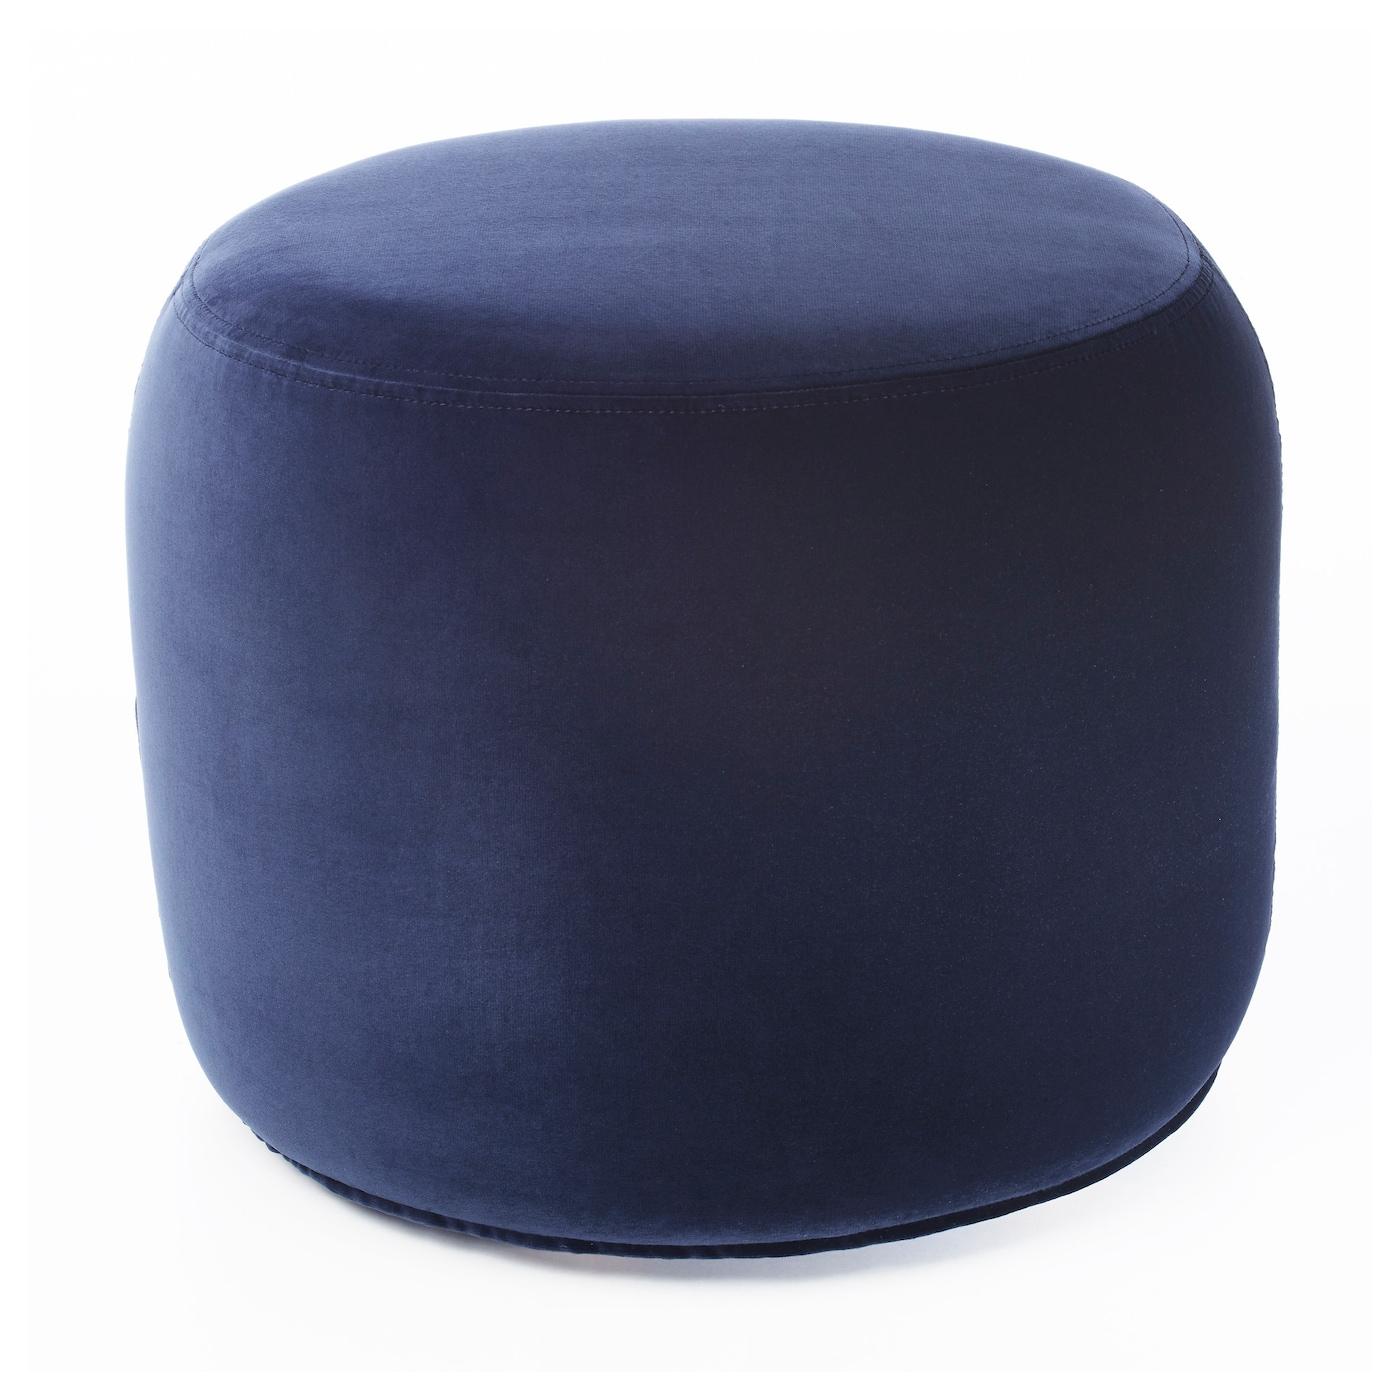 Stockholm 2017 Footstool Sandbacka Dark Blue Ikea